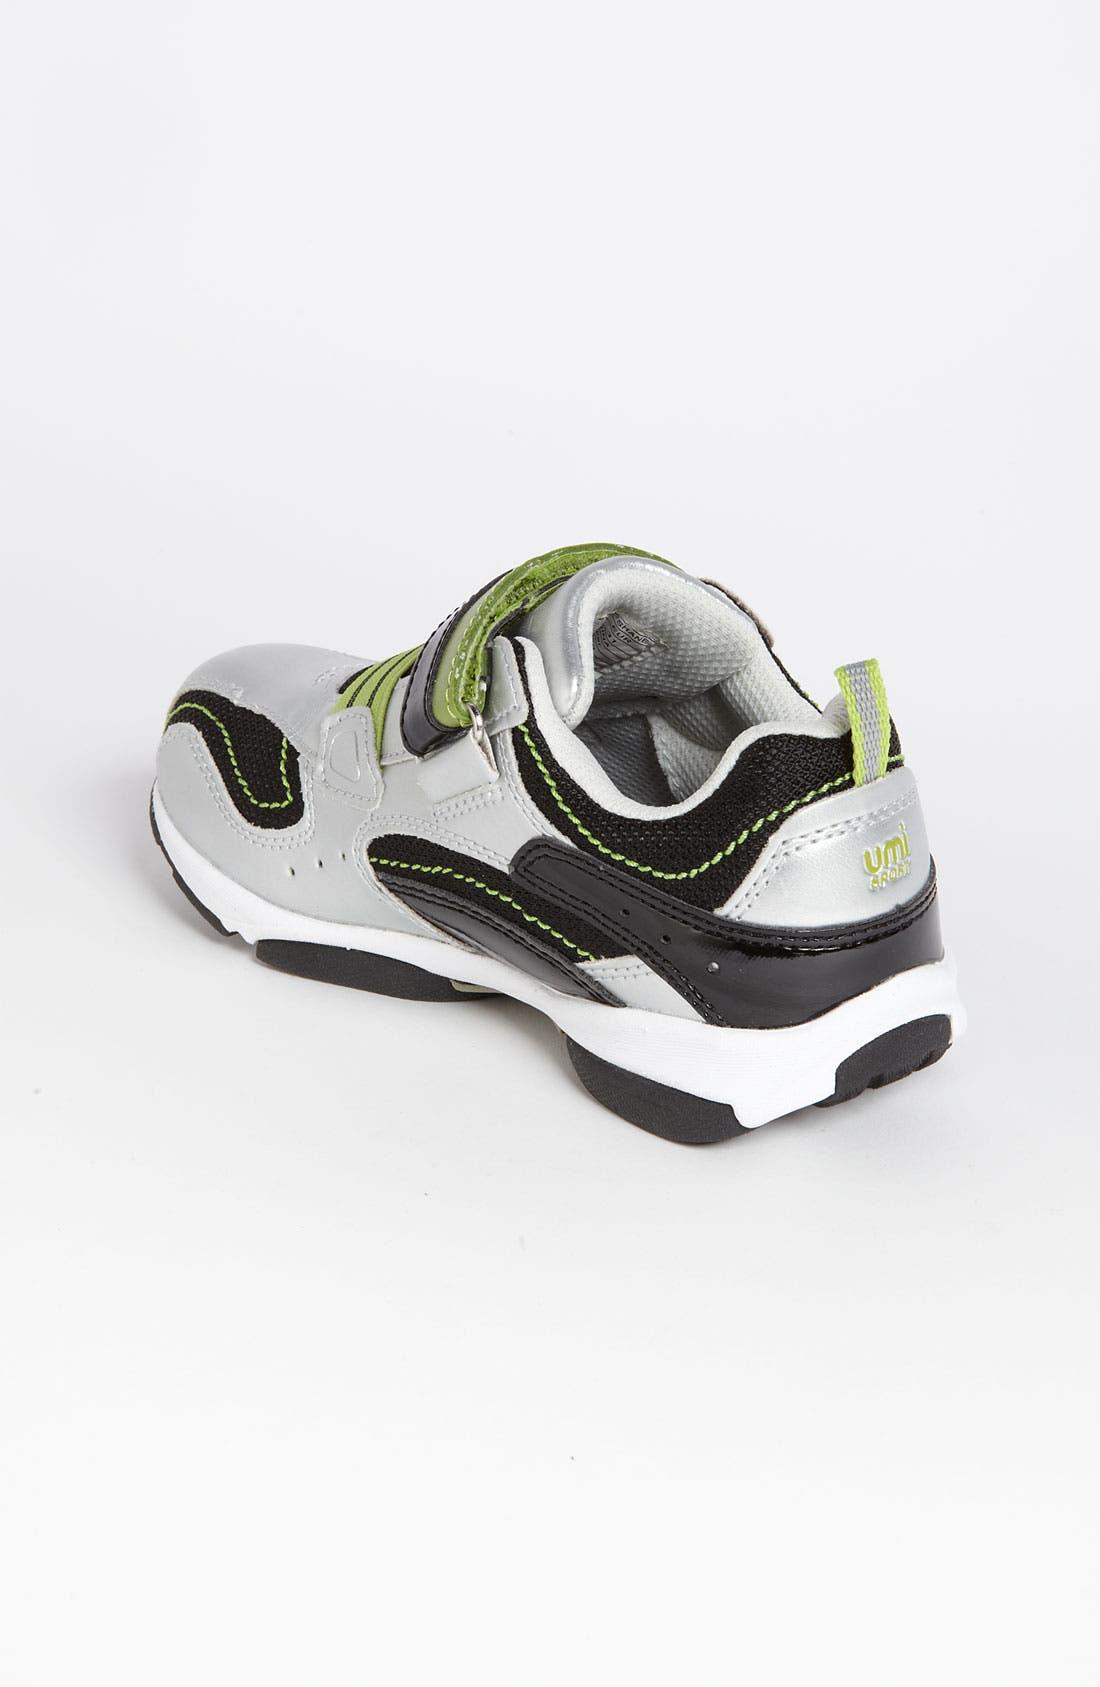 Alternate Image 2  - Umi 'Shane' Sneaker (Toddler, Little Kid & Big Kid)